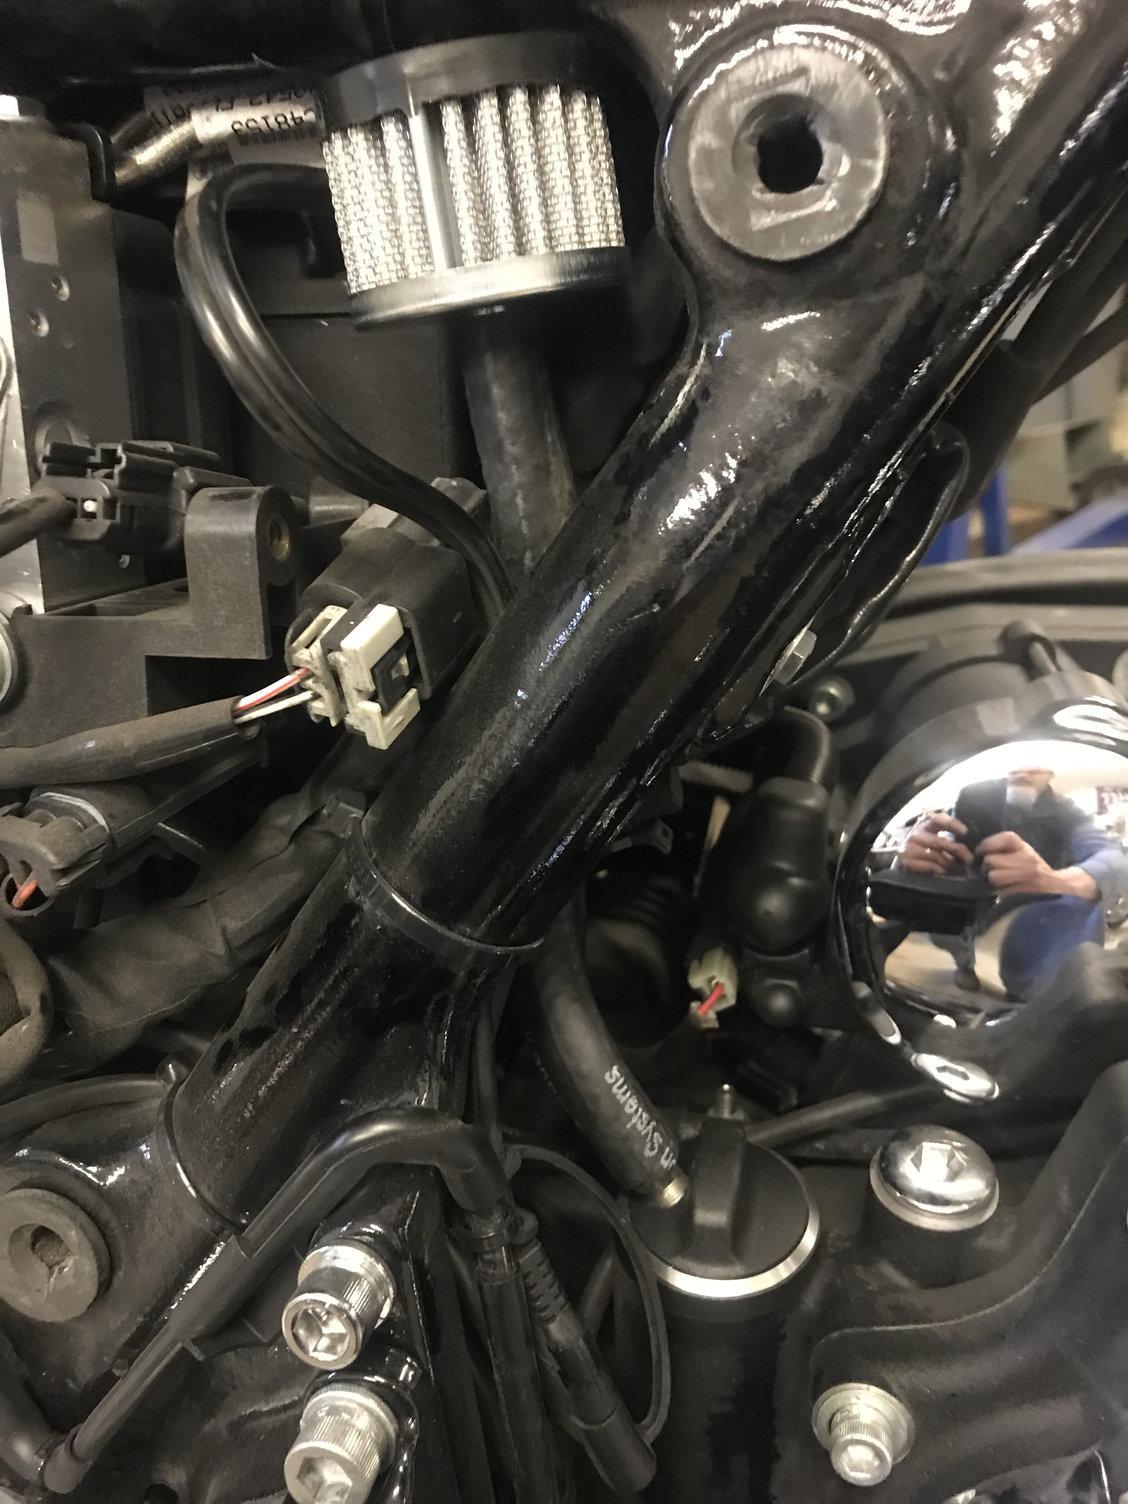 Fueling venting dipstick? - Page 2 - Harley Davidson Forums